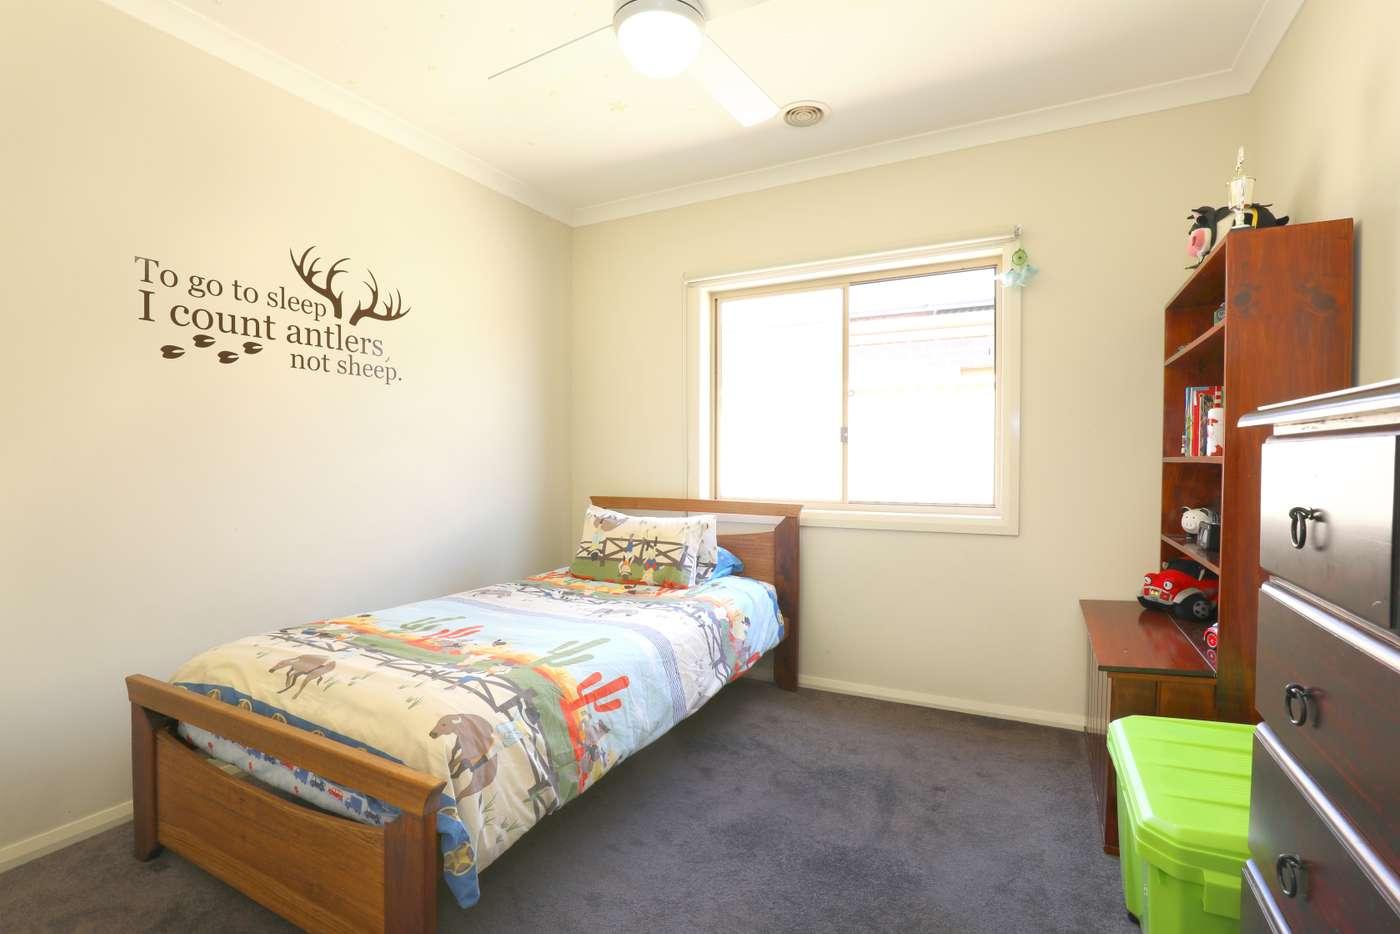 Sixth view of Homely house listing, 6 CORNFLOWER STREET, Pakenham VIC 3810